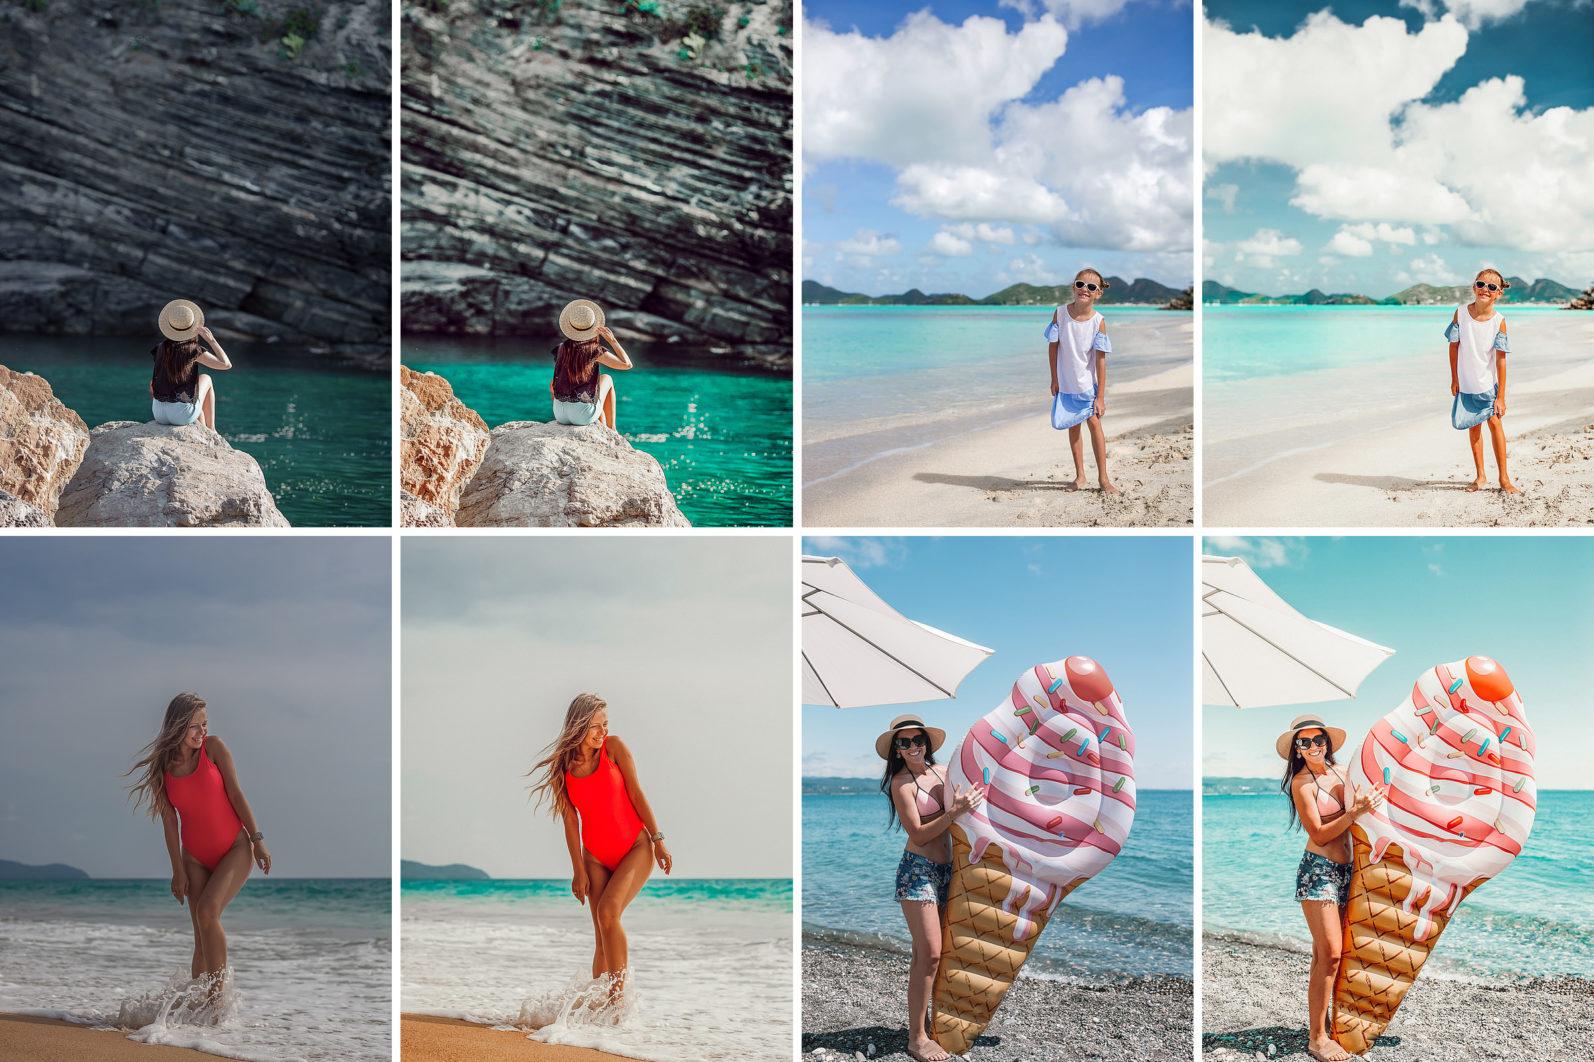 34. Summer Island - 34.SUMMERISLAND 11 -